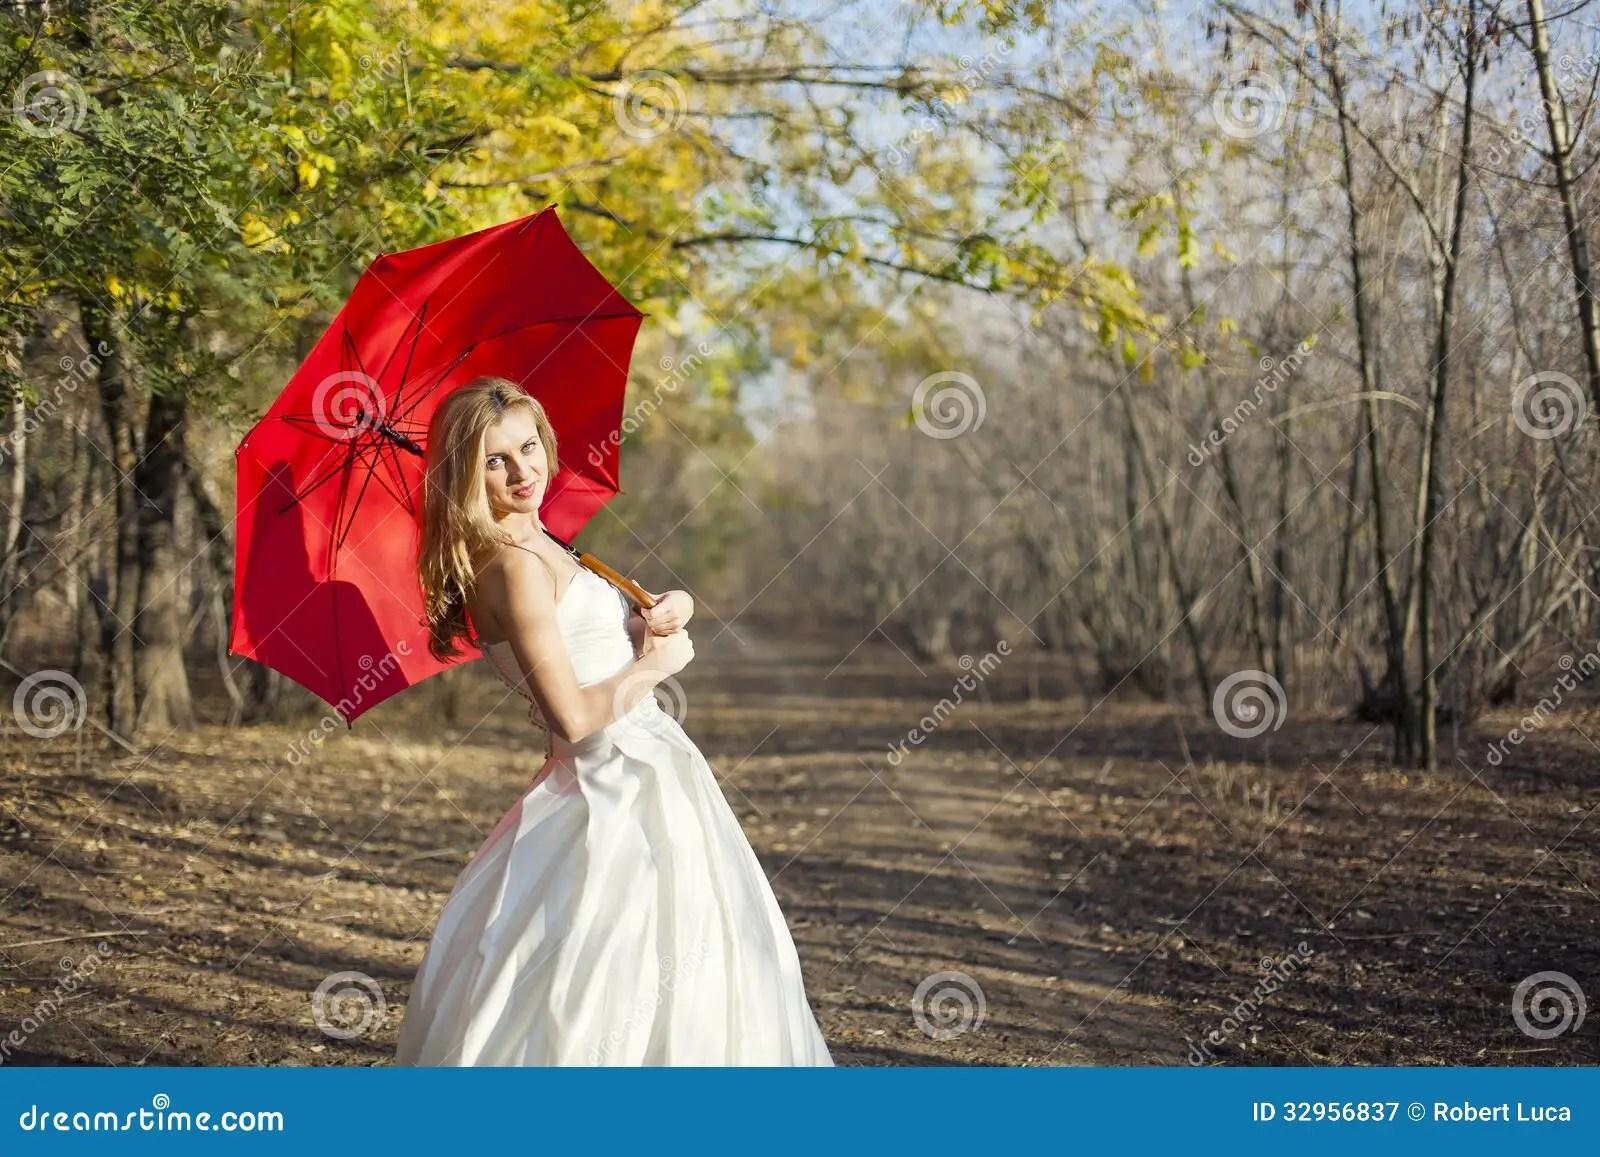 Cute Fairy Wallpaper Download Girl Posing In Wedding Dress Stock Image Image 32956837